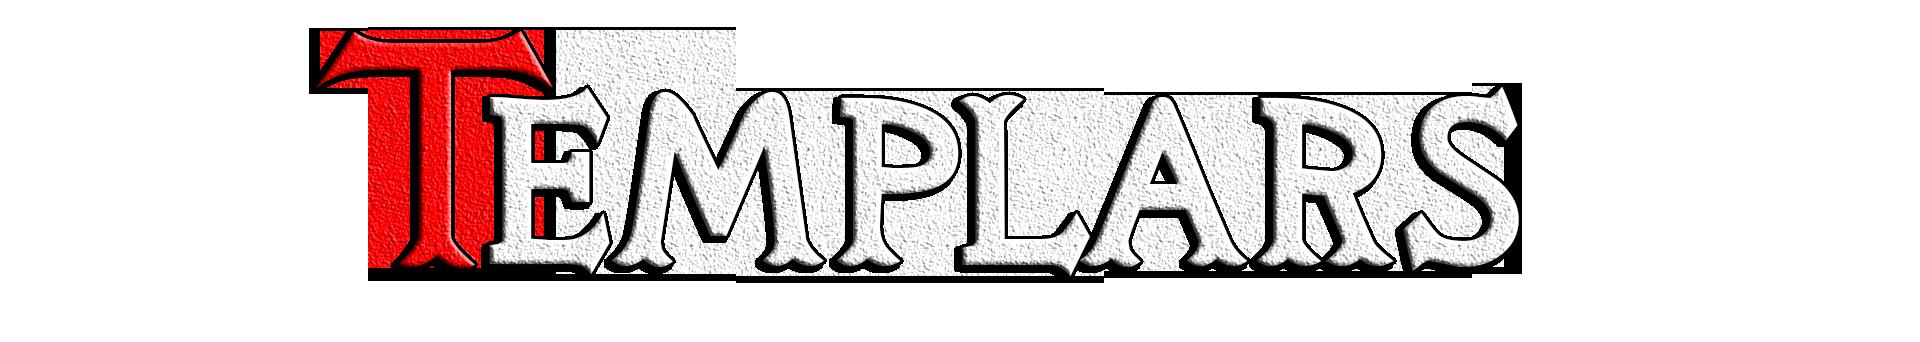 Templars1